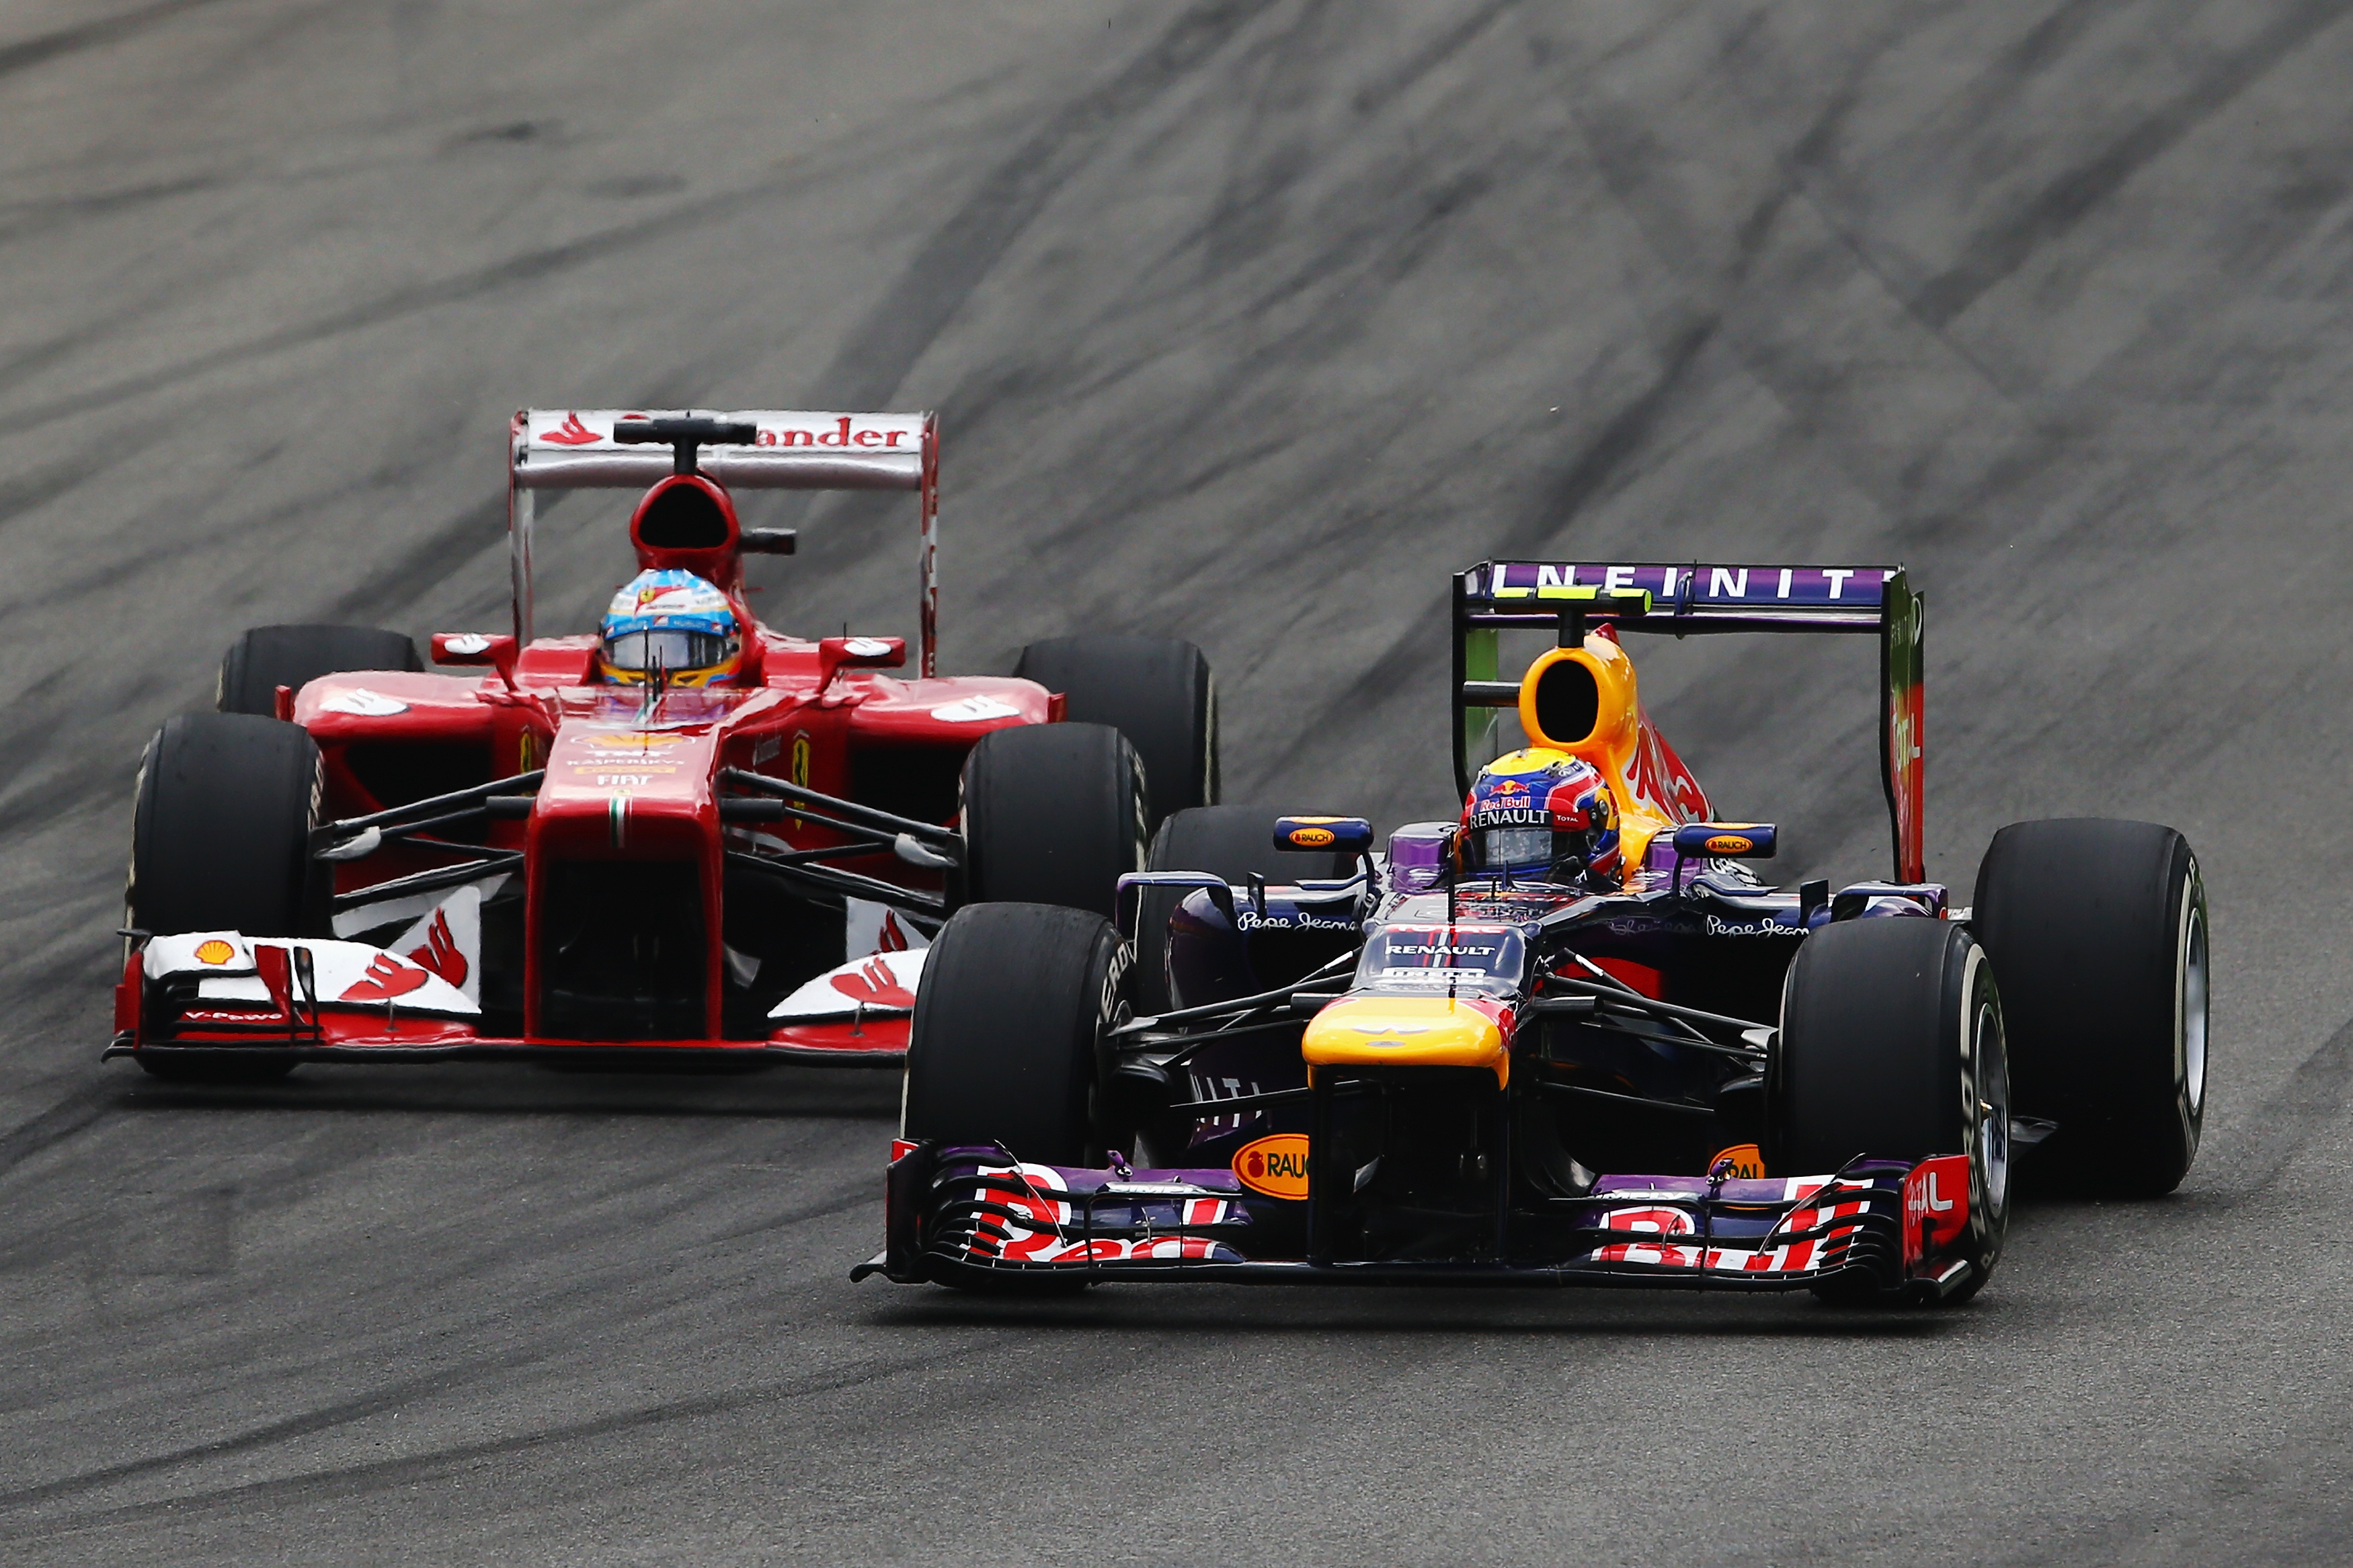 Seb Vettel Takes Dominant Italian Grand Prix Victory